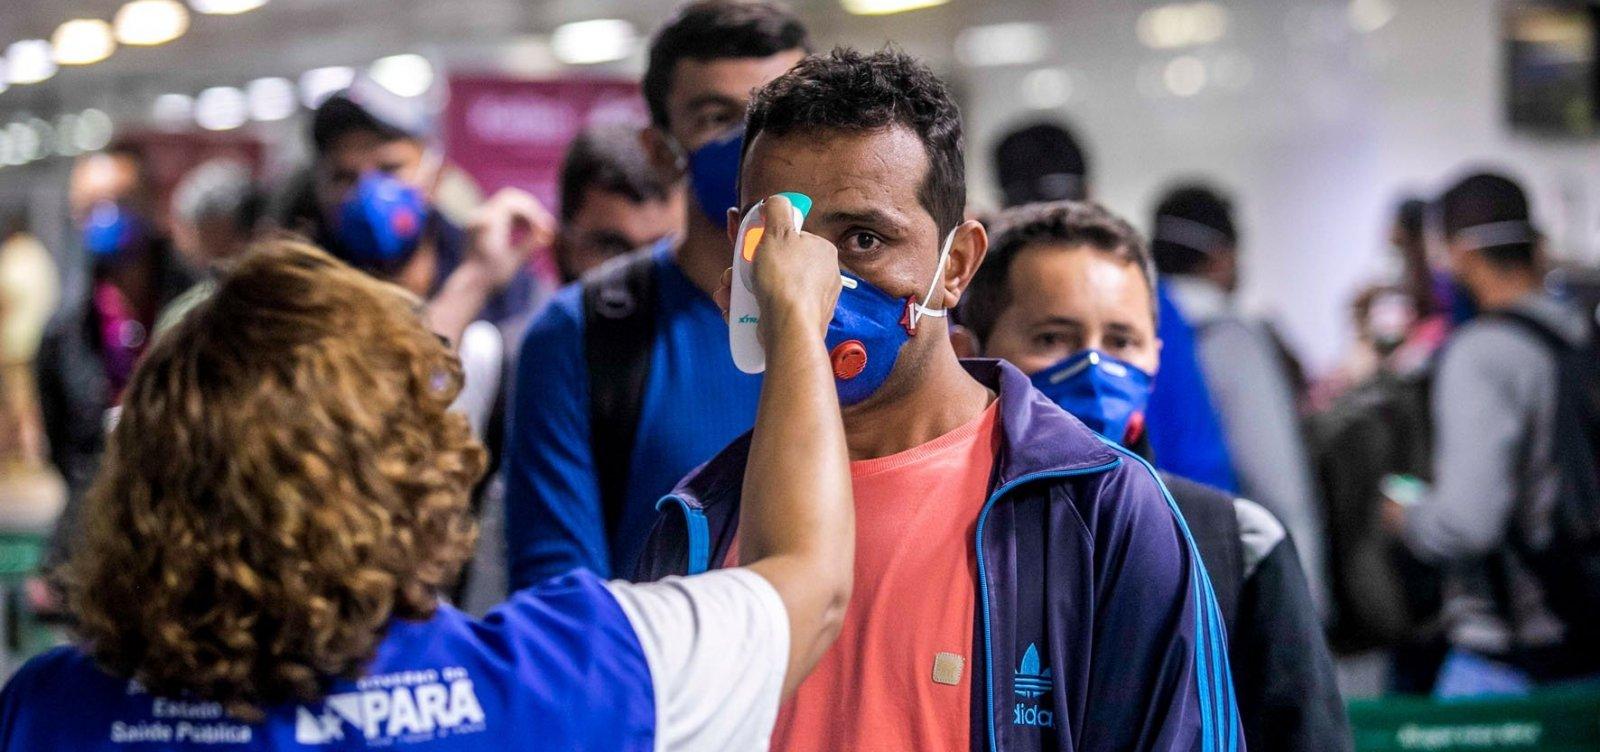 Camaçari: operadoras devem disponibilizar  '156' para atender casos de coronavírus